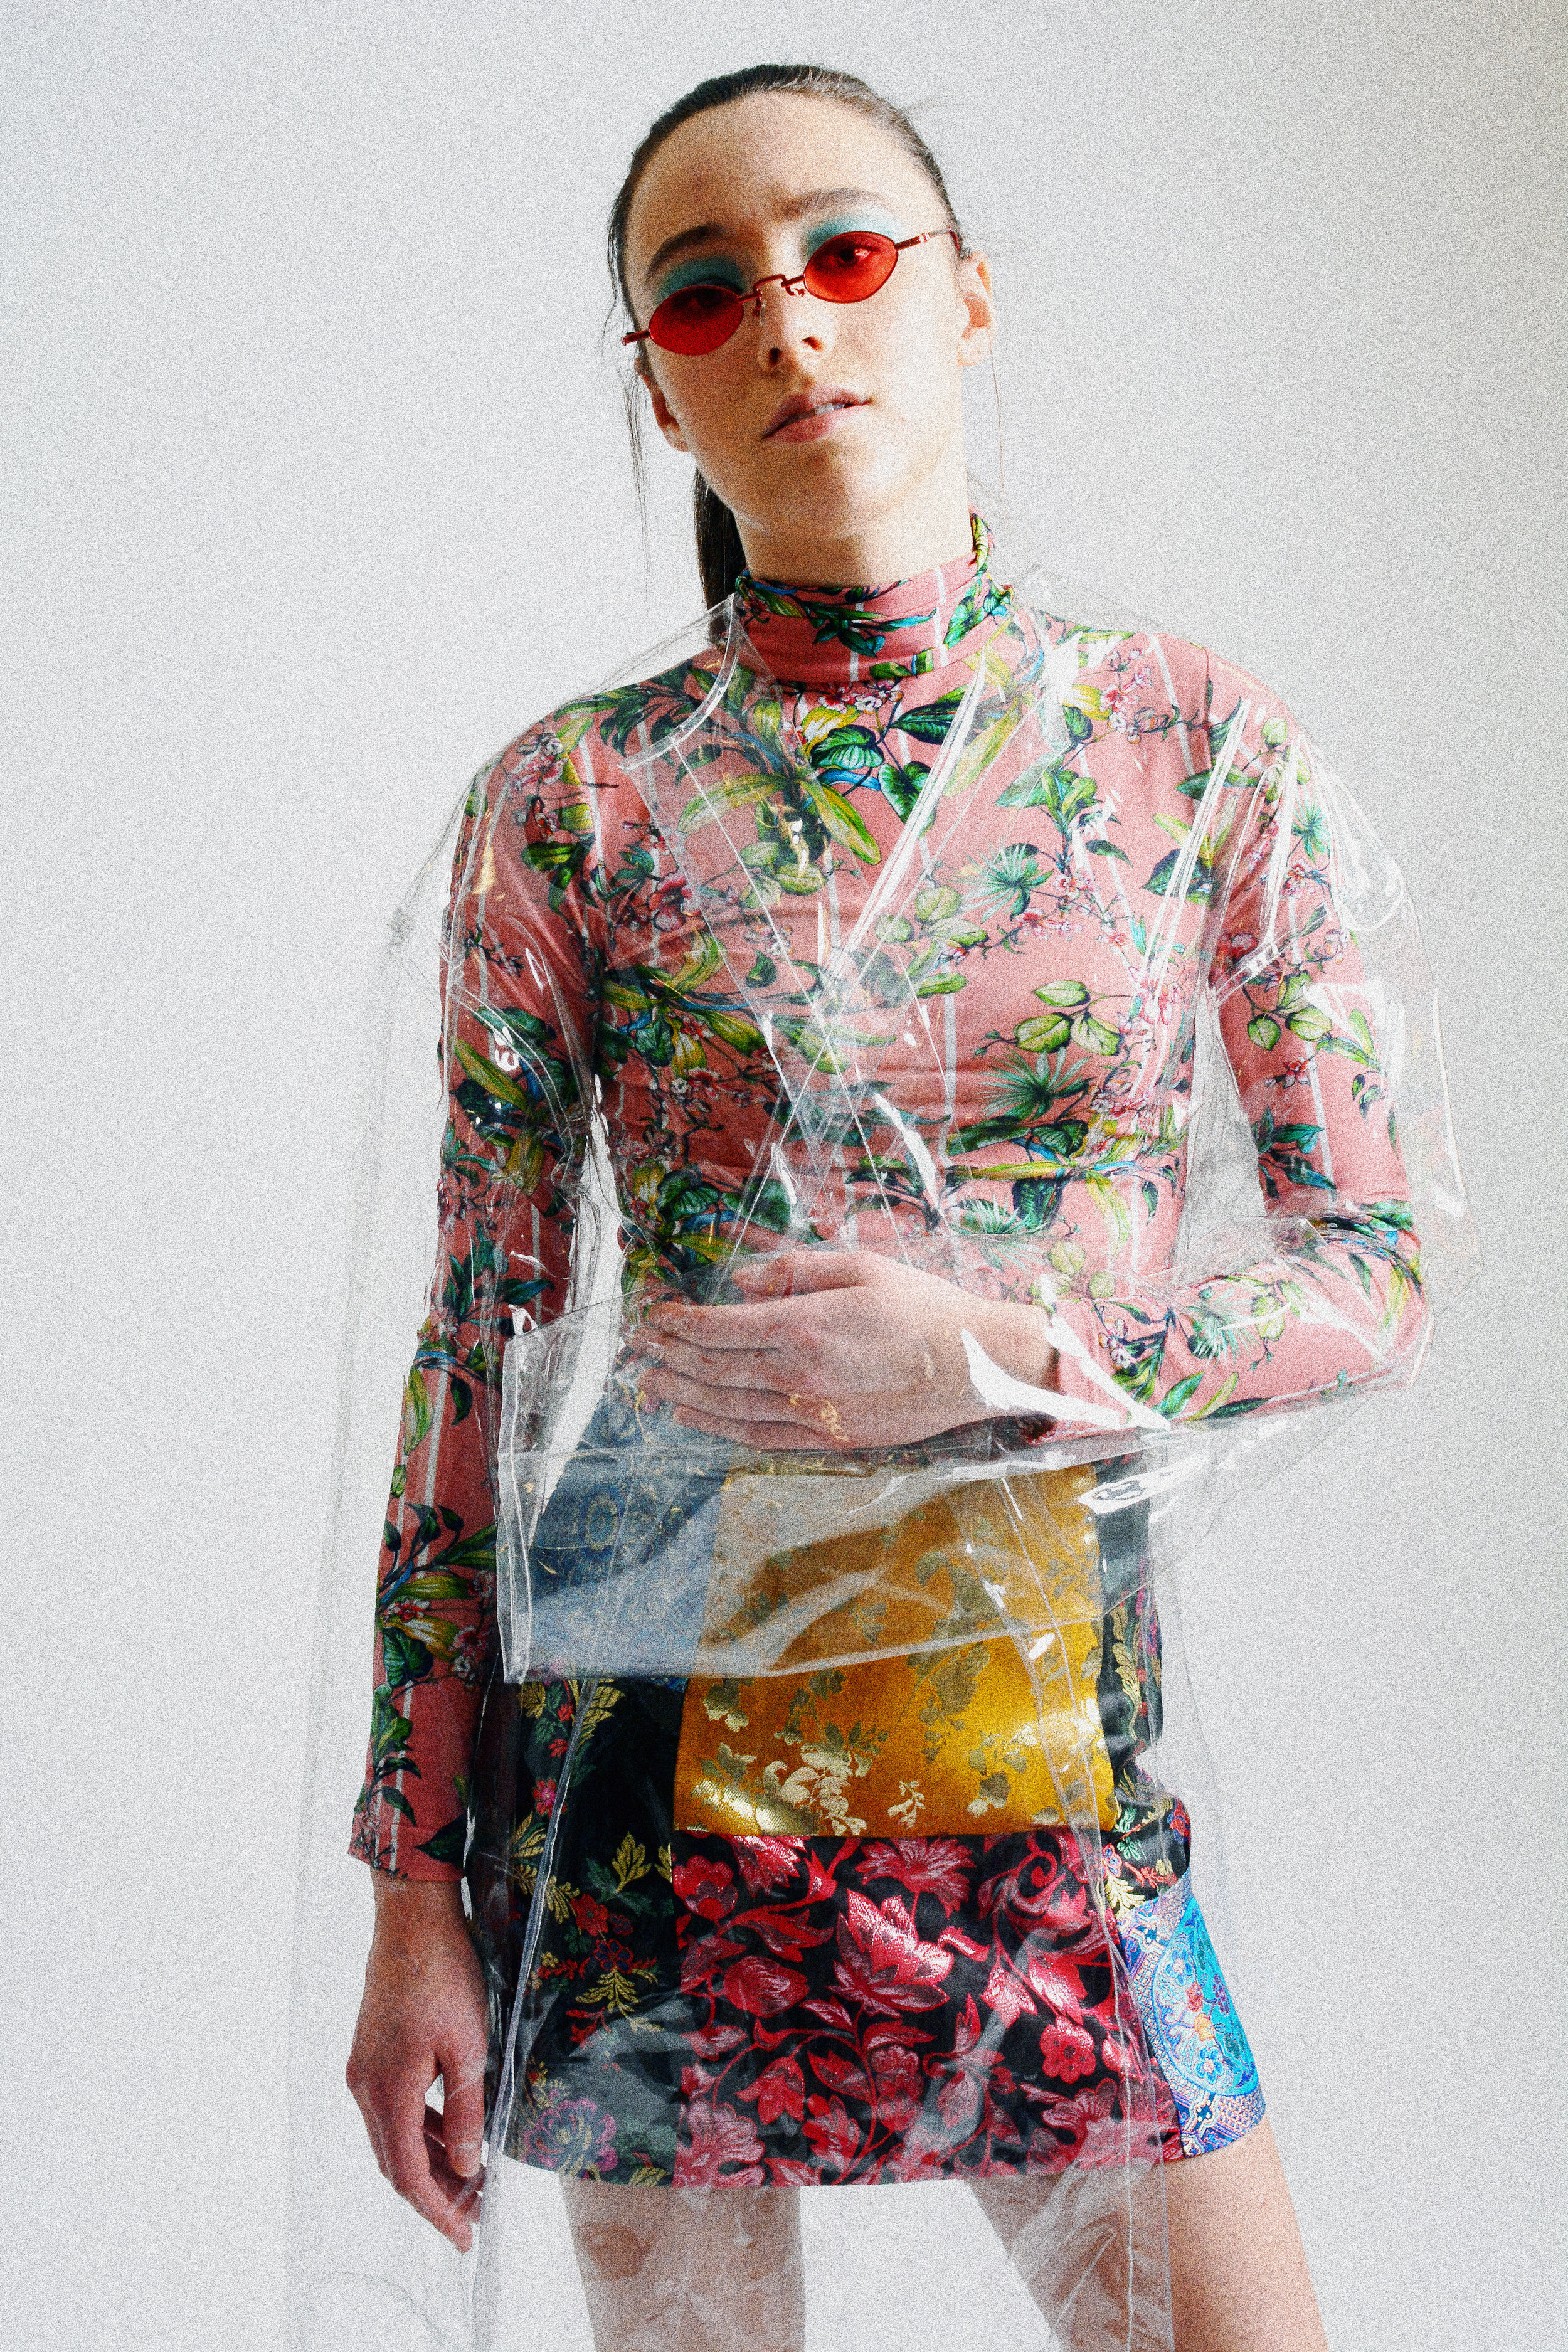 Dress: Vetements Jacket: NOT DEAD YET Skirt: Alicia & Olivia Socks: Stance David Bowie Colab Shoes: Steve Madden Sunglasses: Mooki May